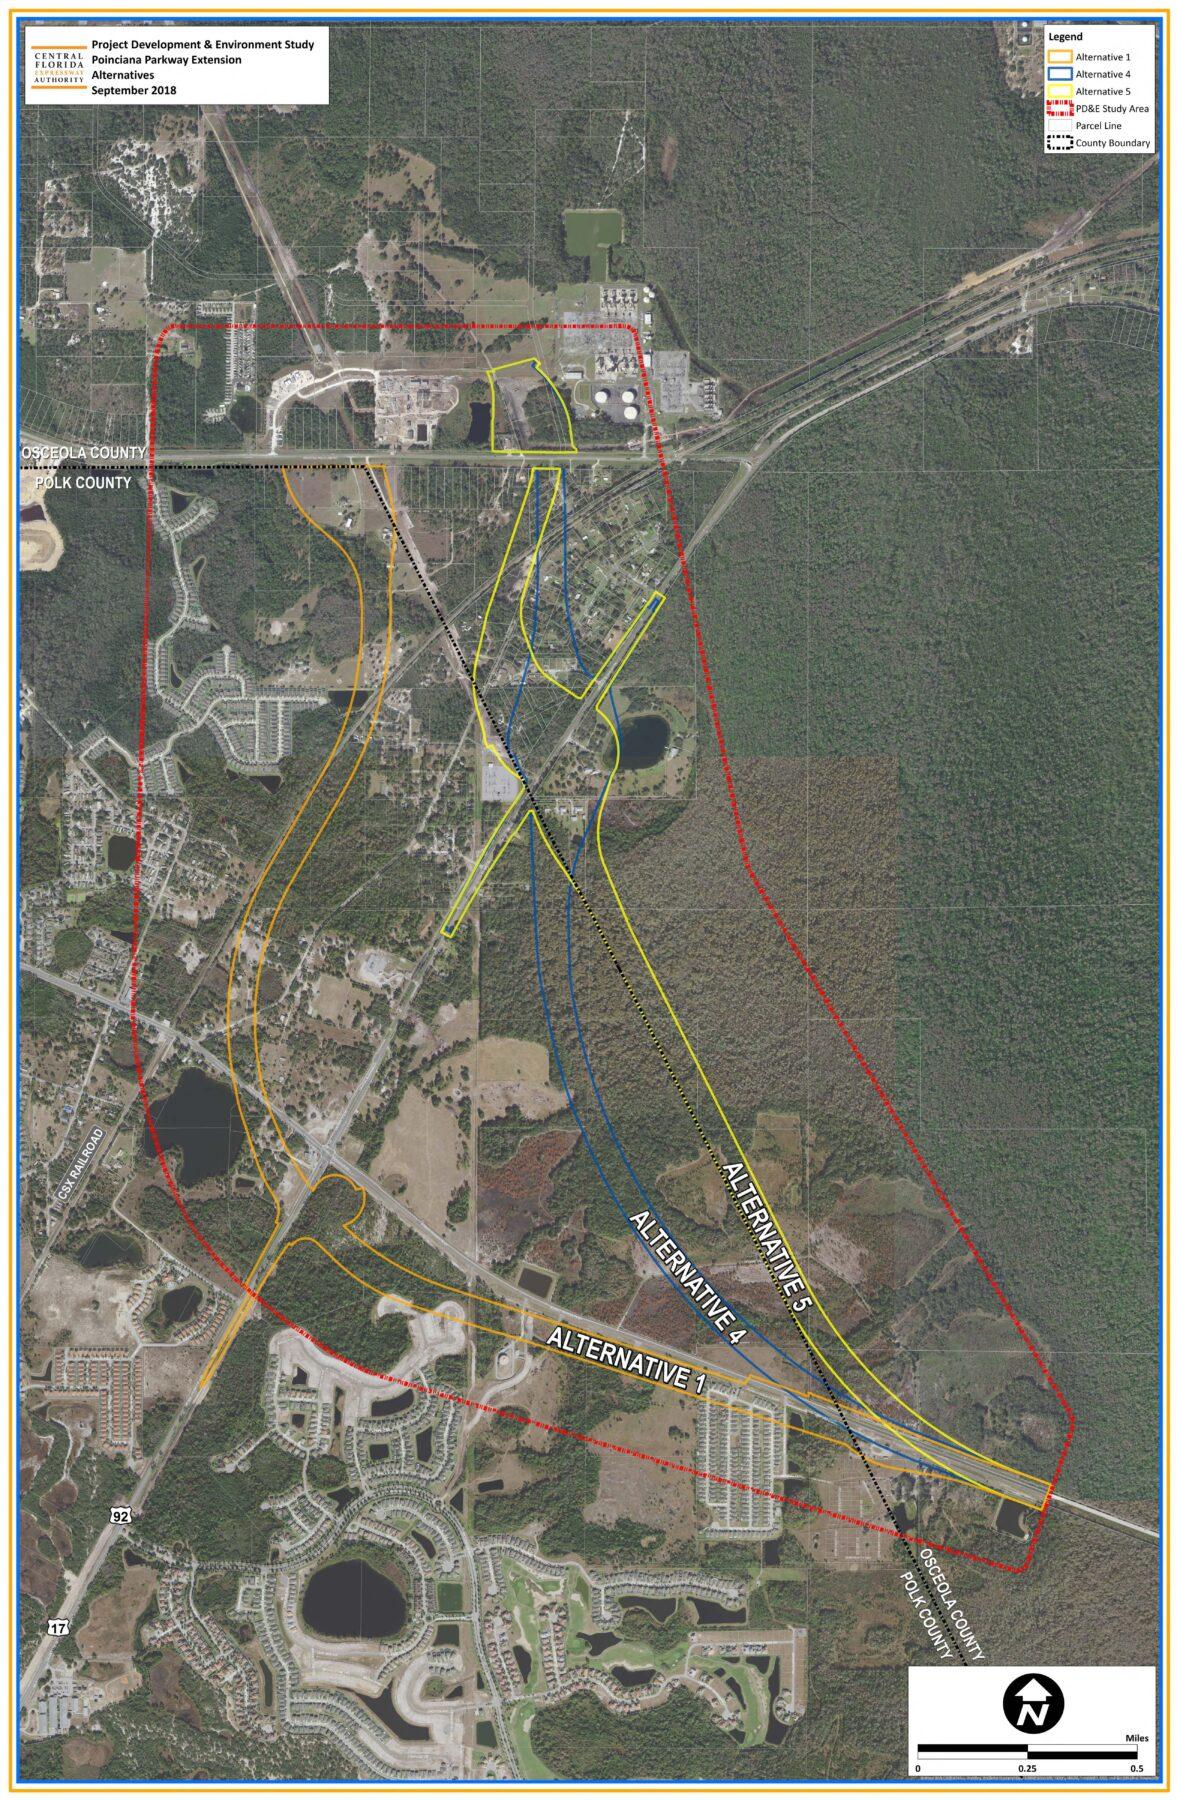 PD&E Study - Poinciana Parkway Extension - cfxway.com